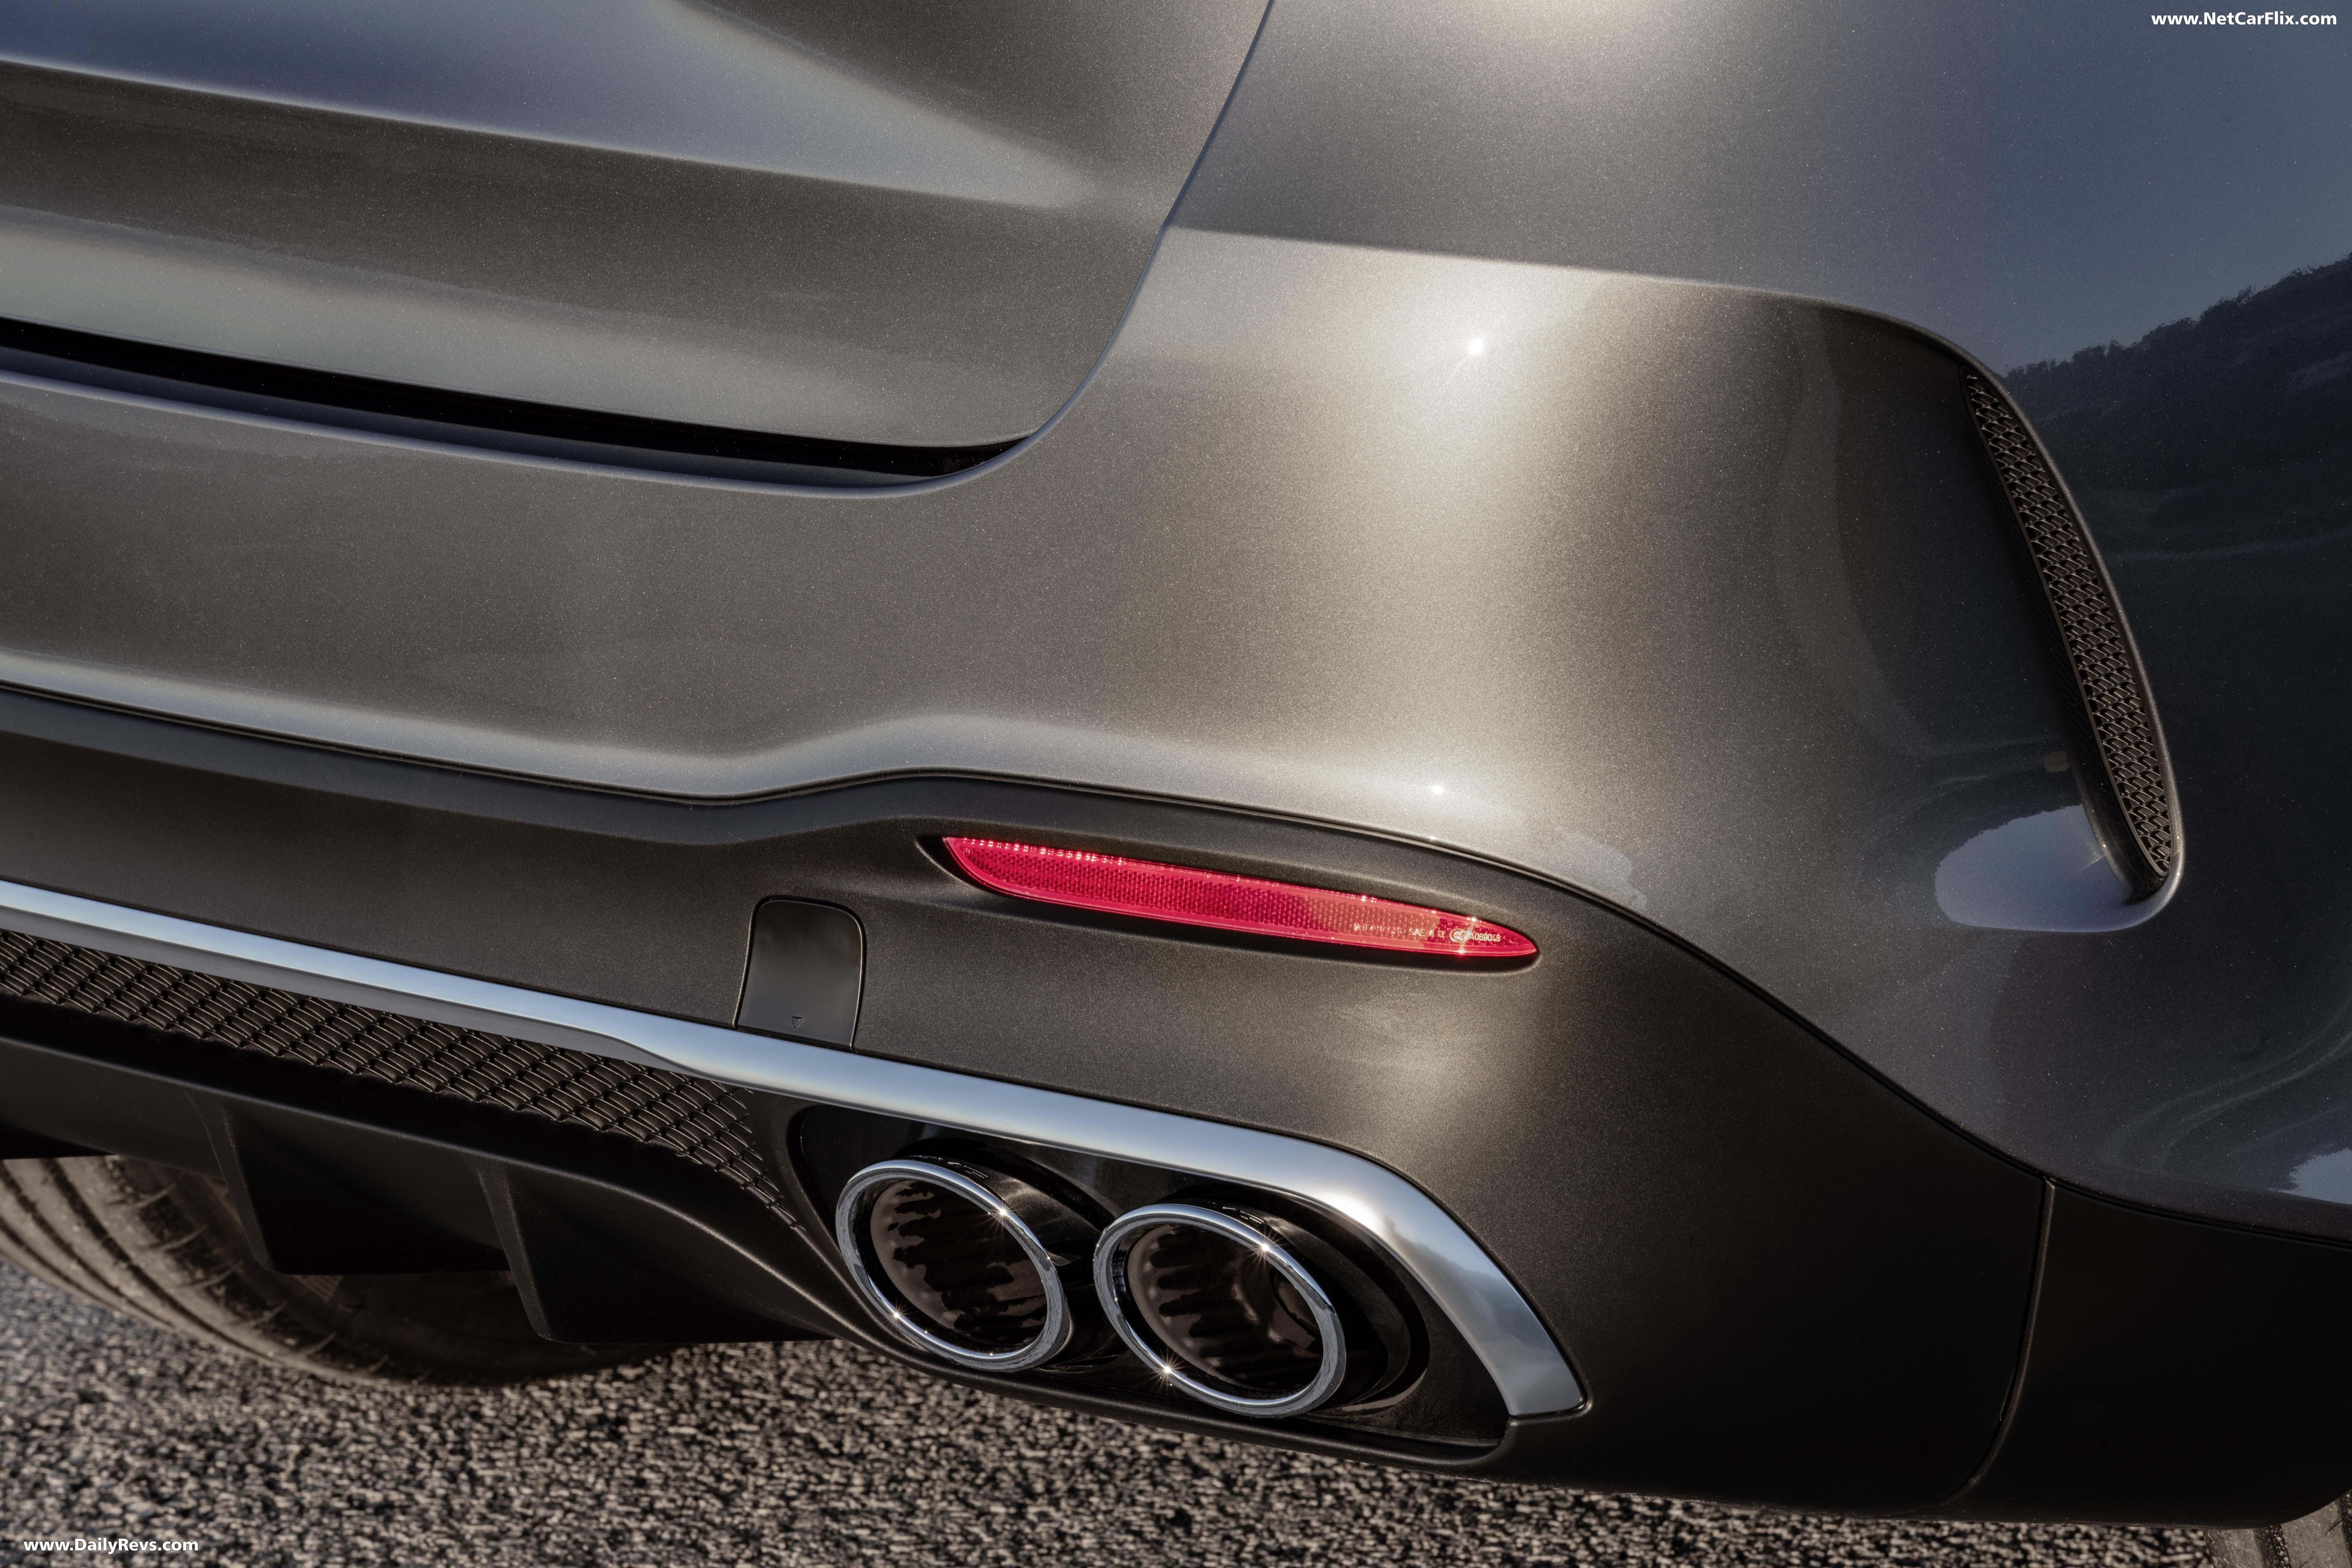 2020 Mercedes-Benz GLE53 AMG 4Matic full